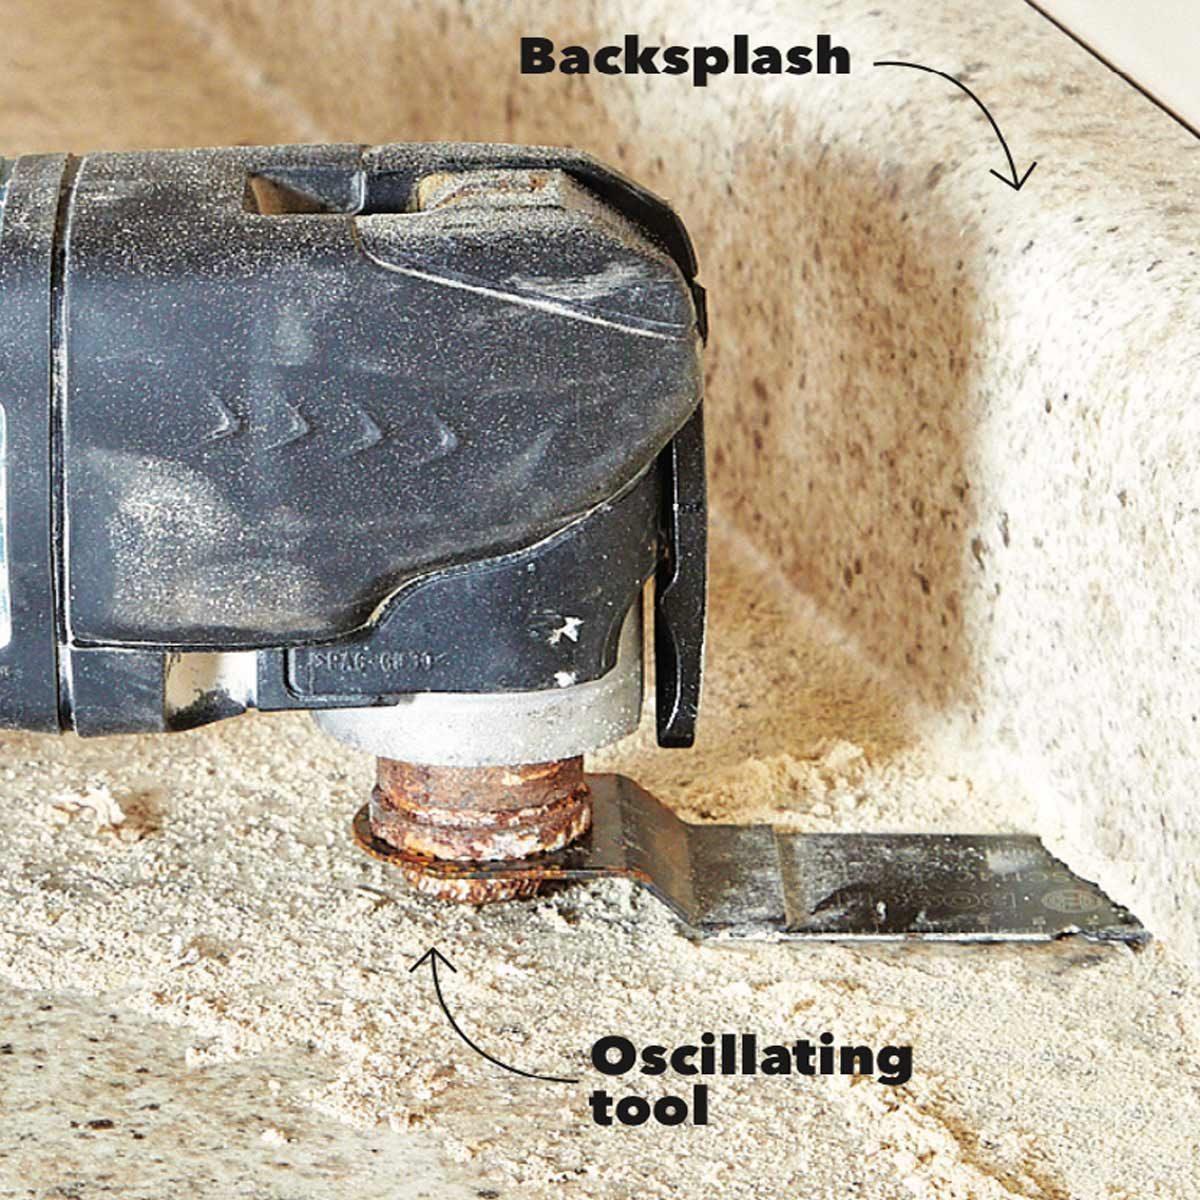 Cut off countertop backsplash